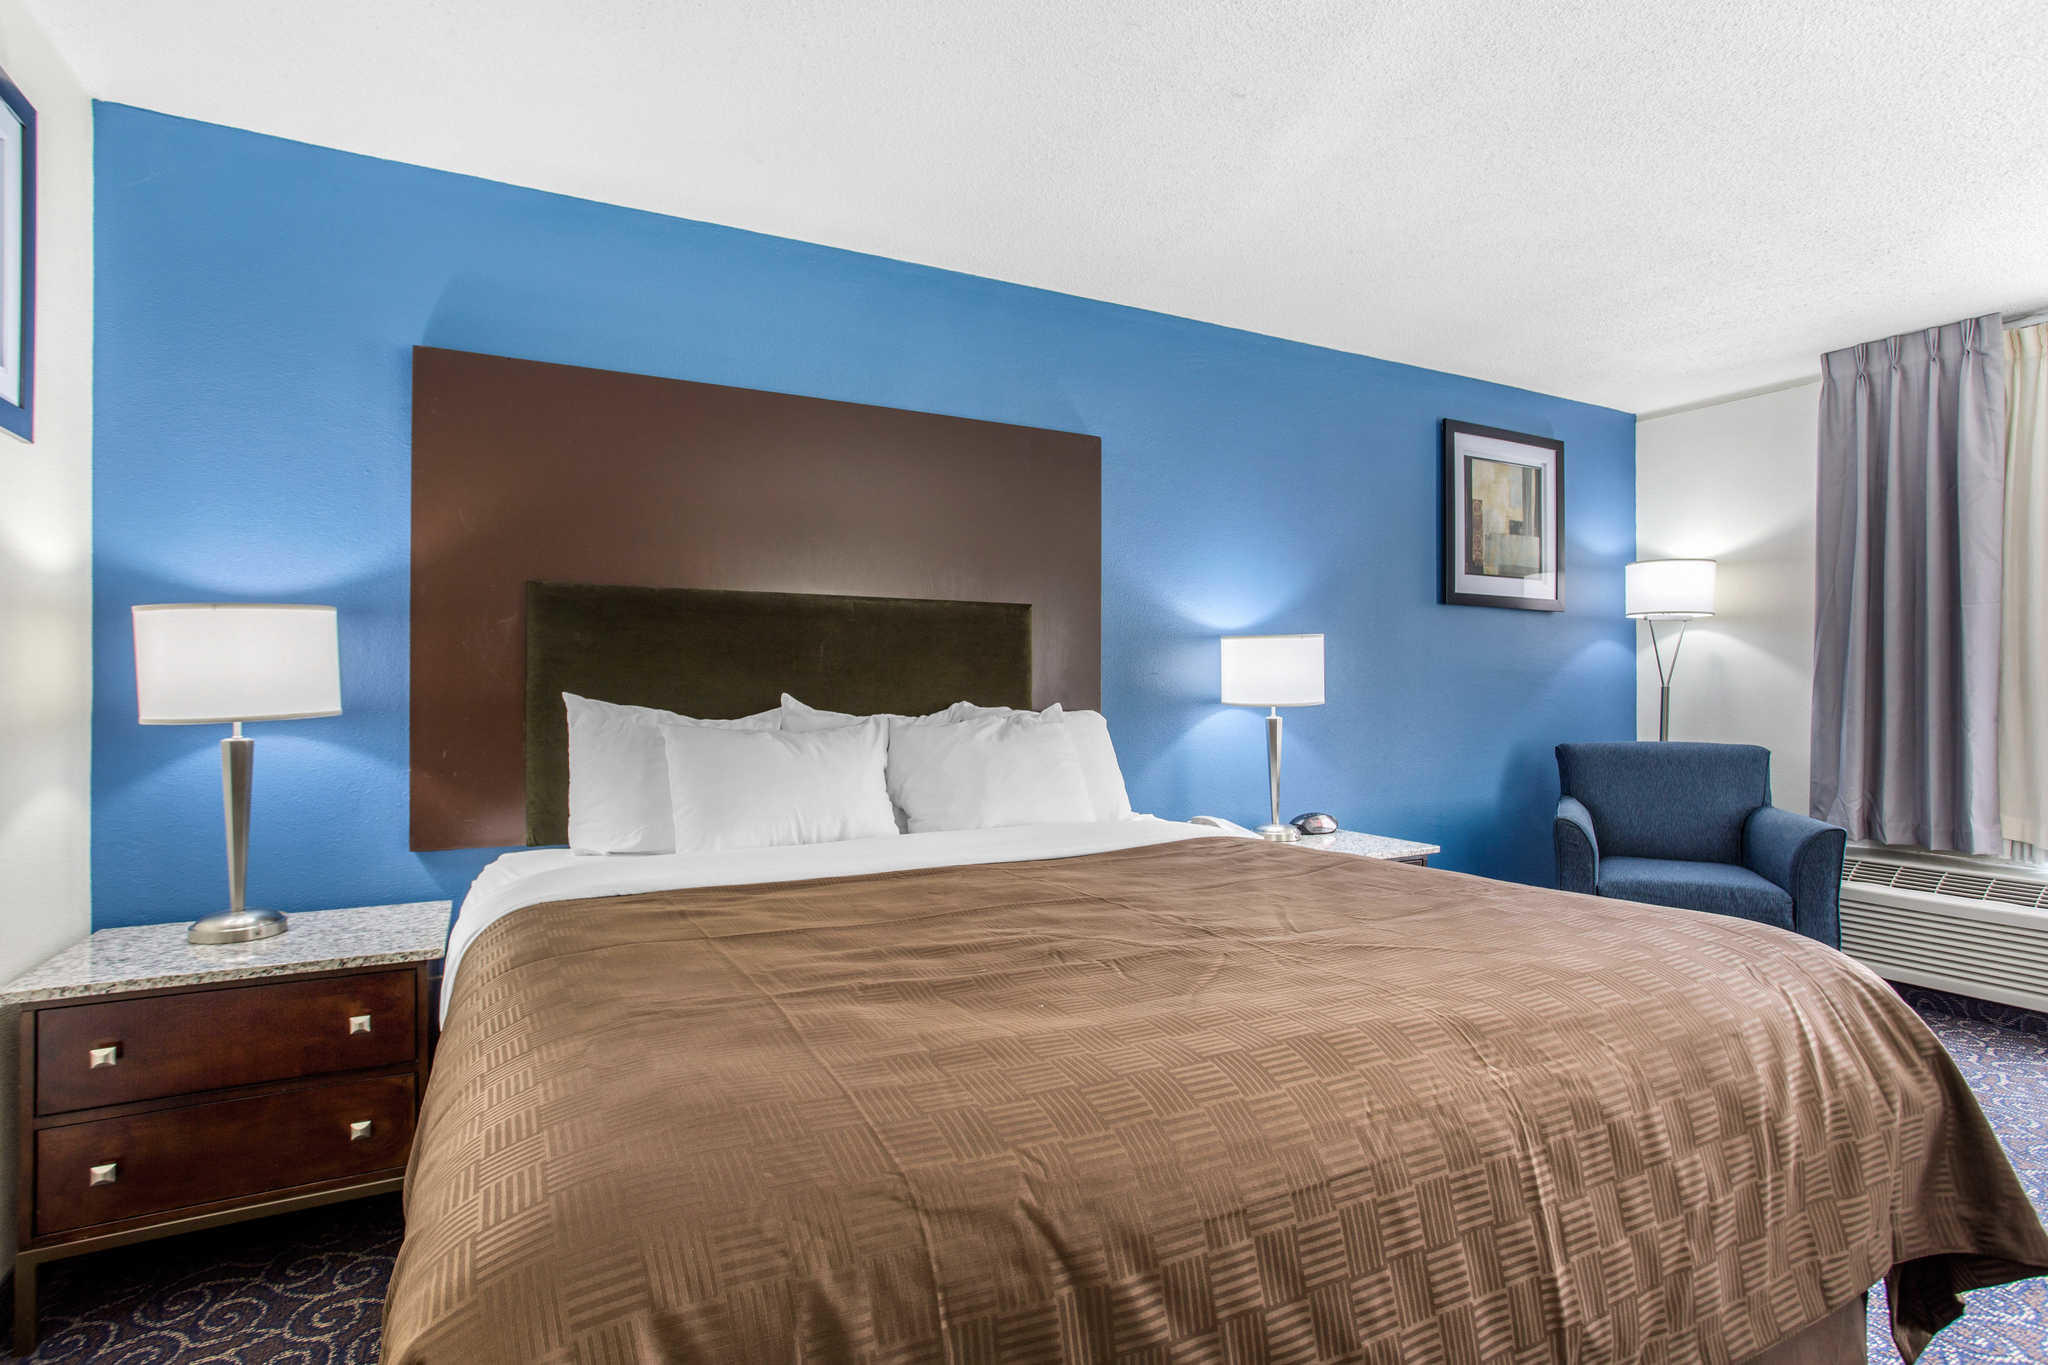 Clarion Inn & Suites image 13